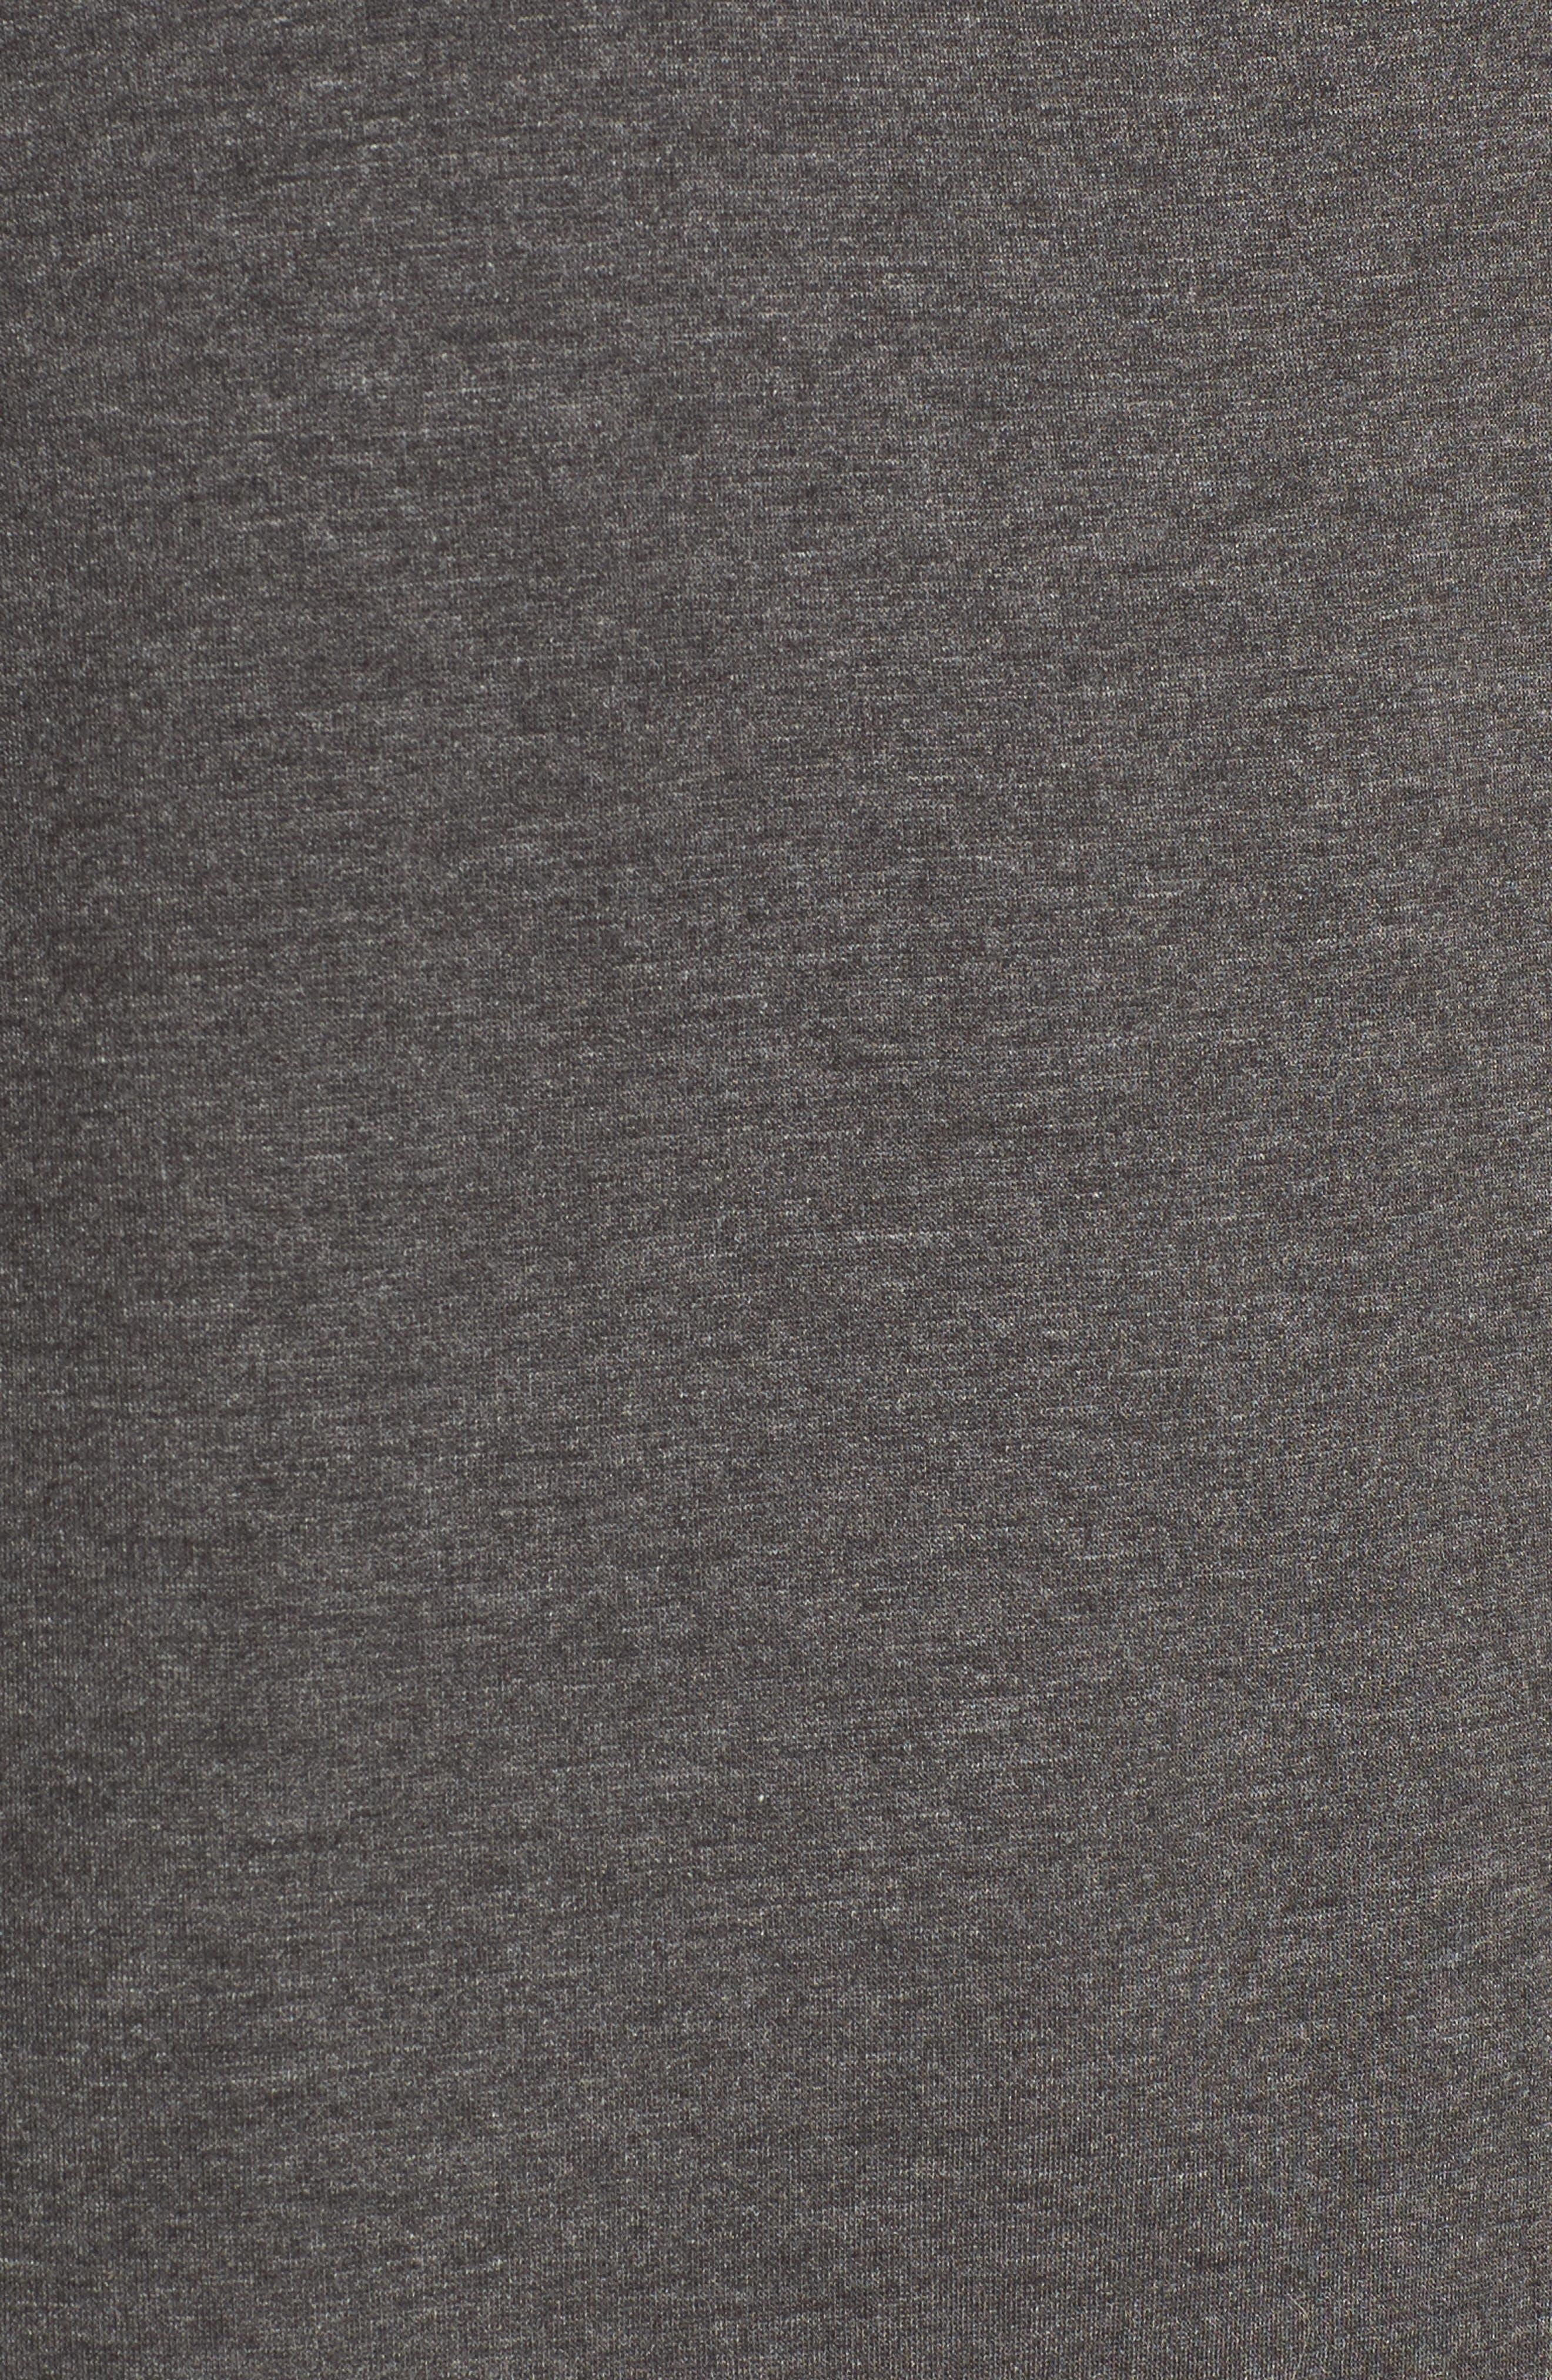 Ruffle Sleeve Sweater Dress,                             Alternate thumbnail 5, color,                             Charcoal